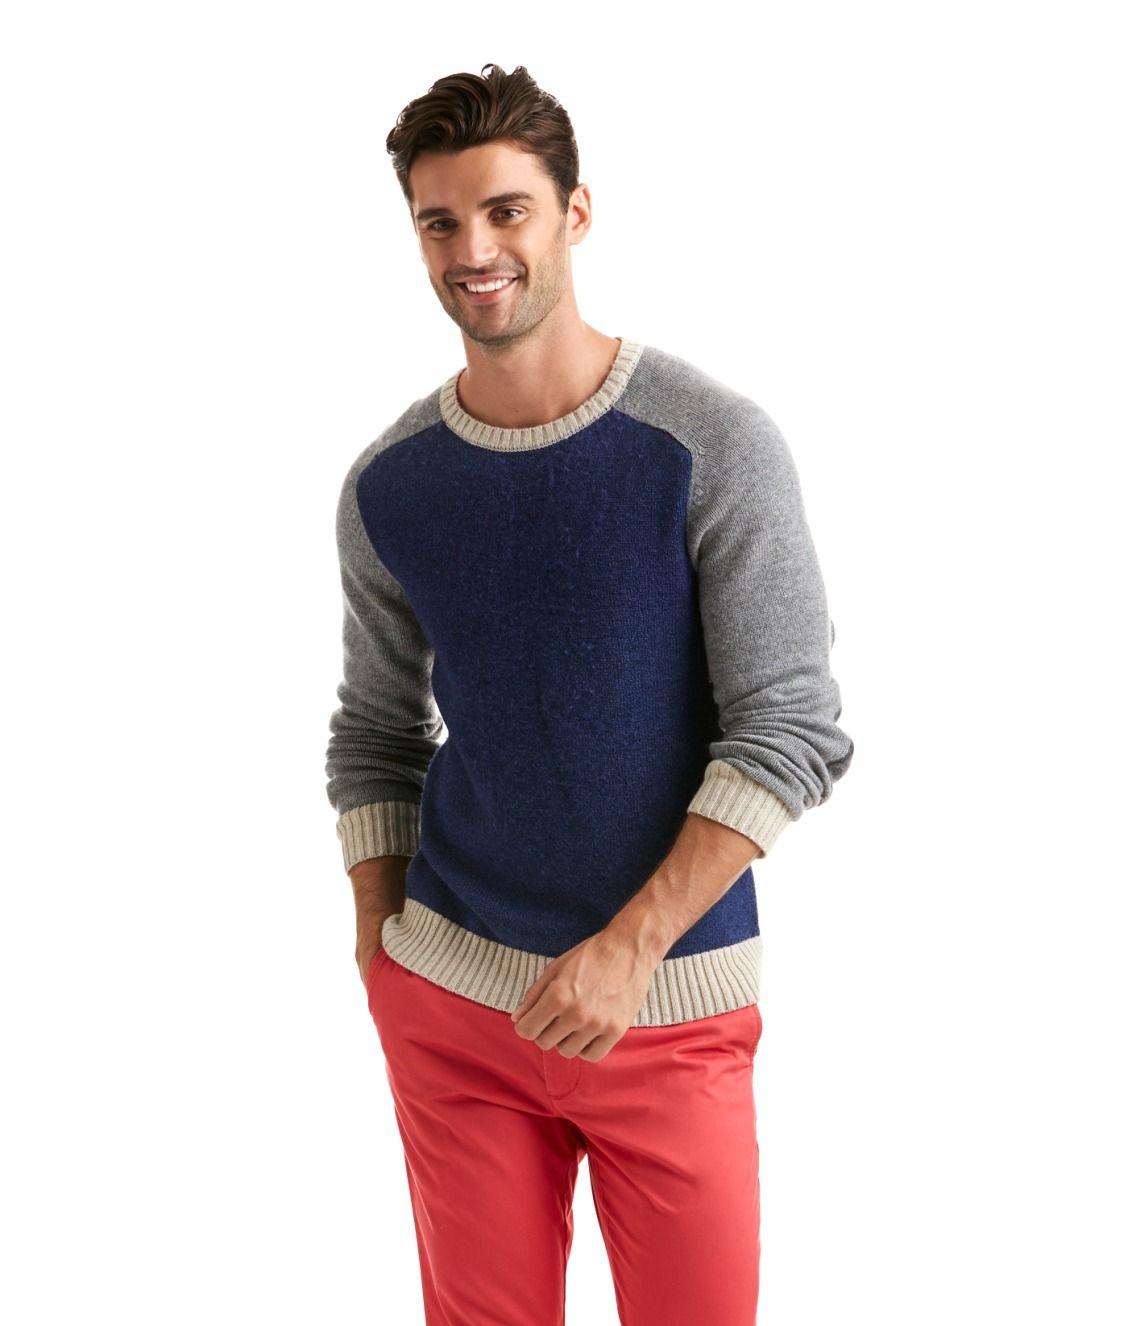 Party crew neck sweater fall fundamentals pinterest crew neck